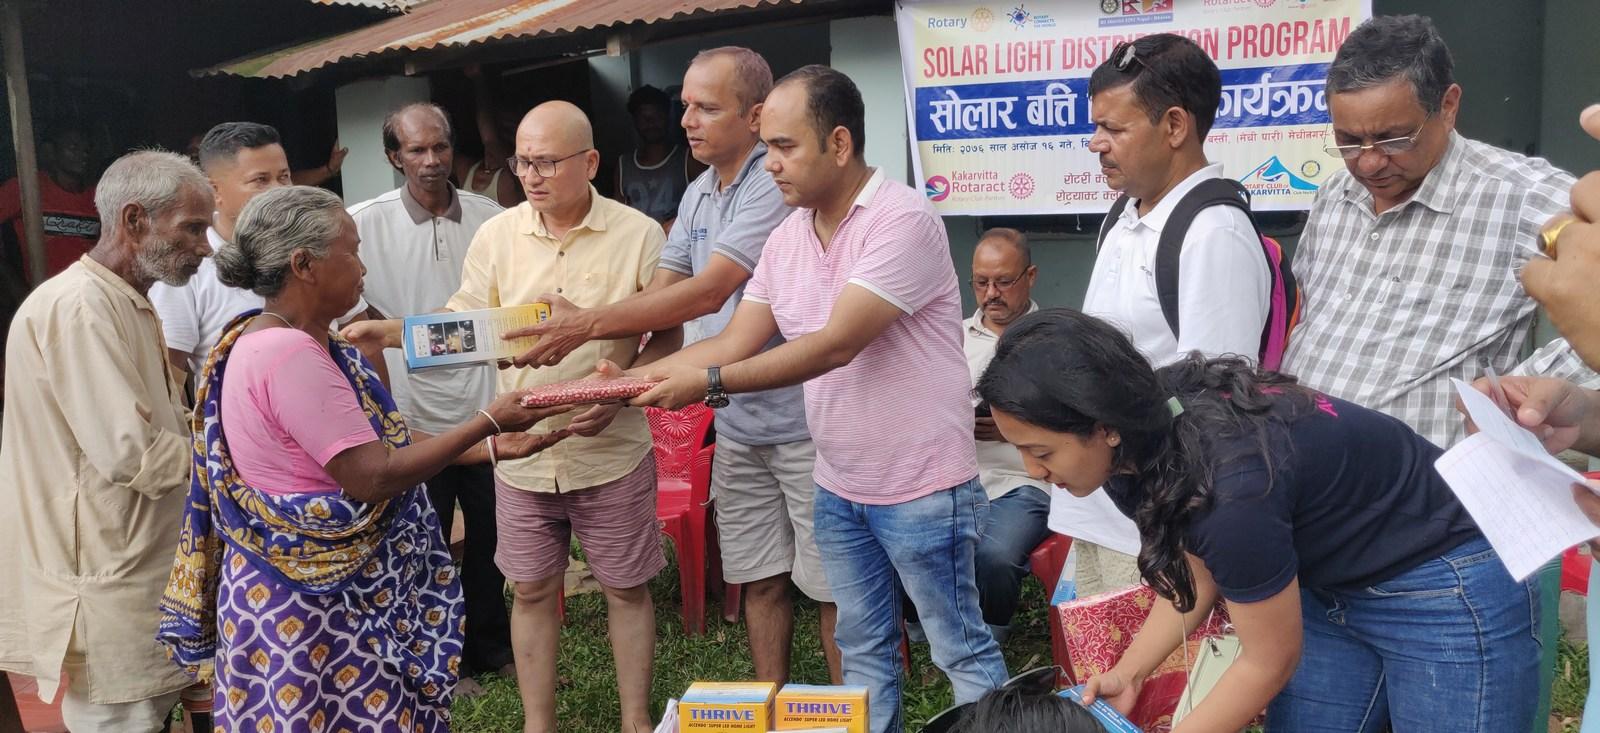 Solar-Light-Distribution-Program-Rotary-Club-of-Kakarvitta-29